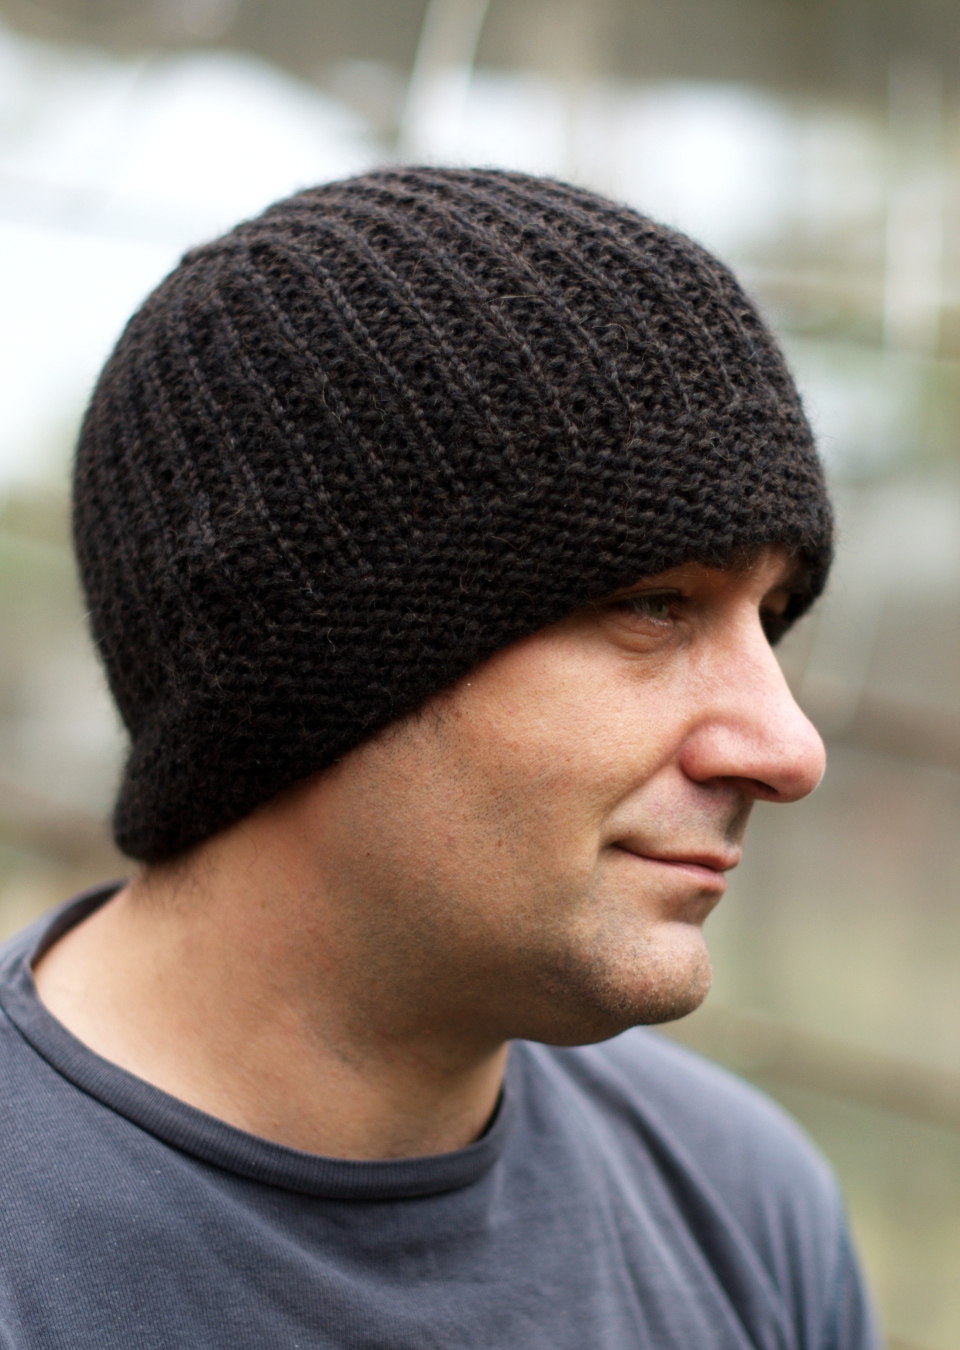 Geko Mens Beanie Hat Knitting Kit 9f0cedf4ca4